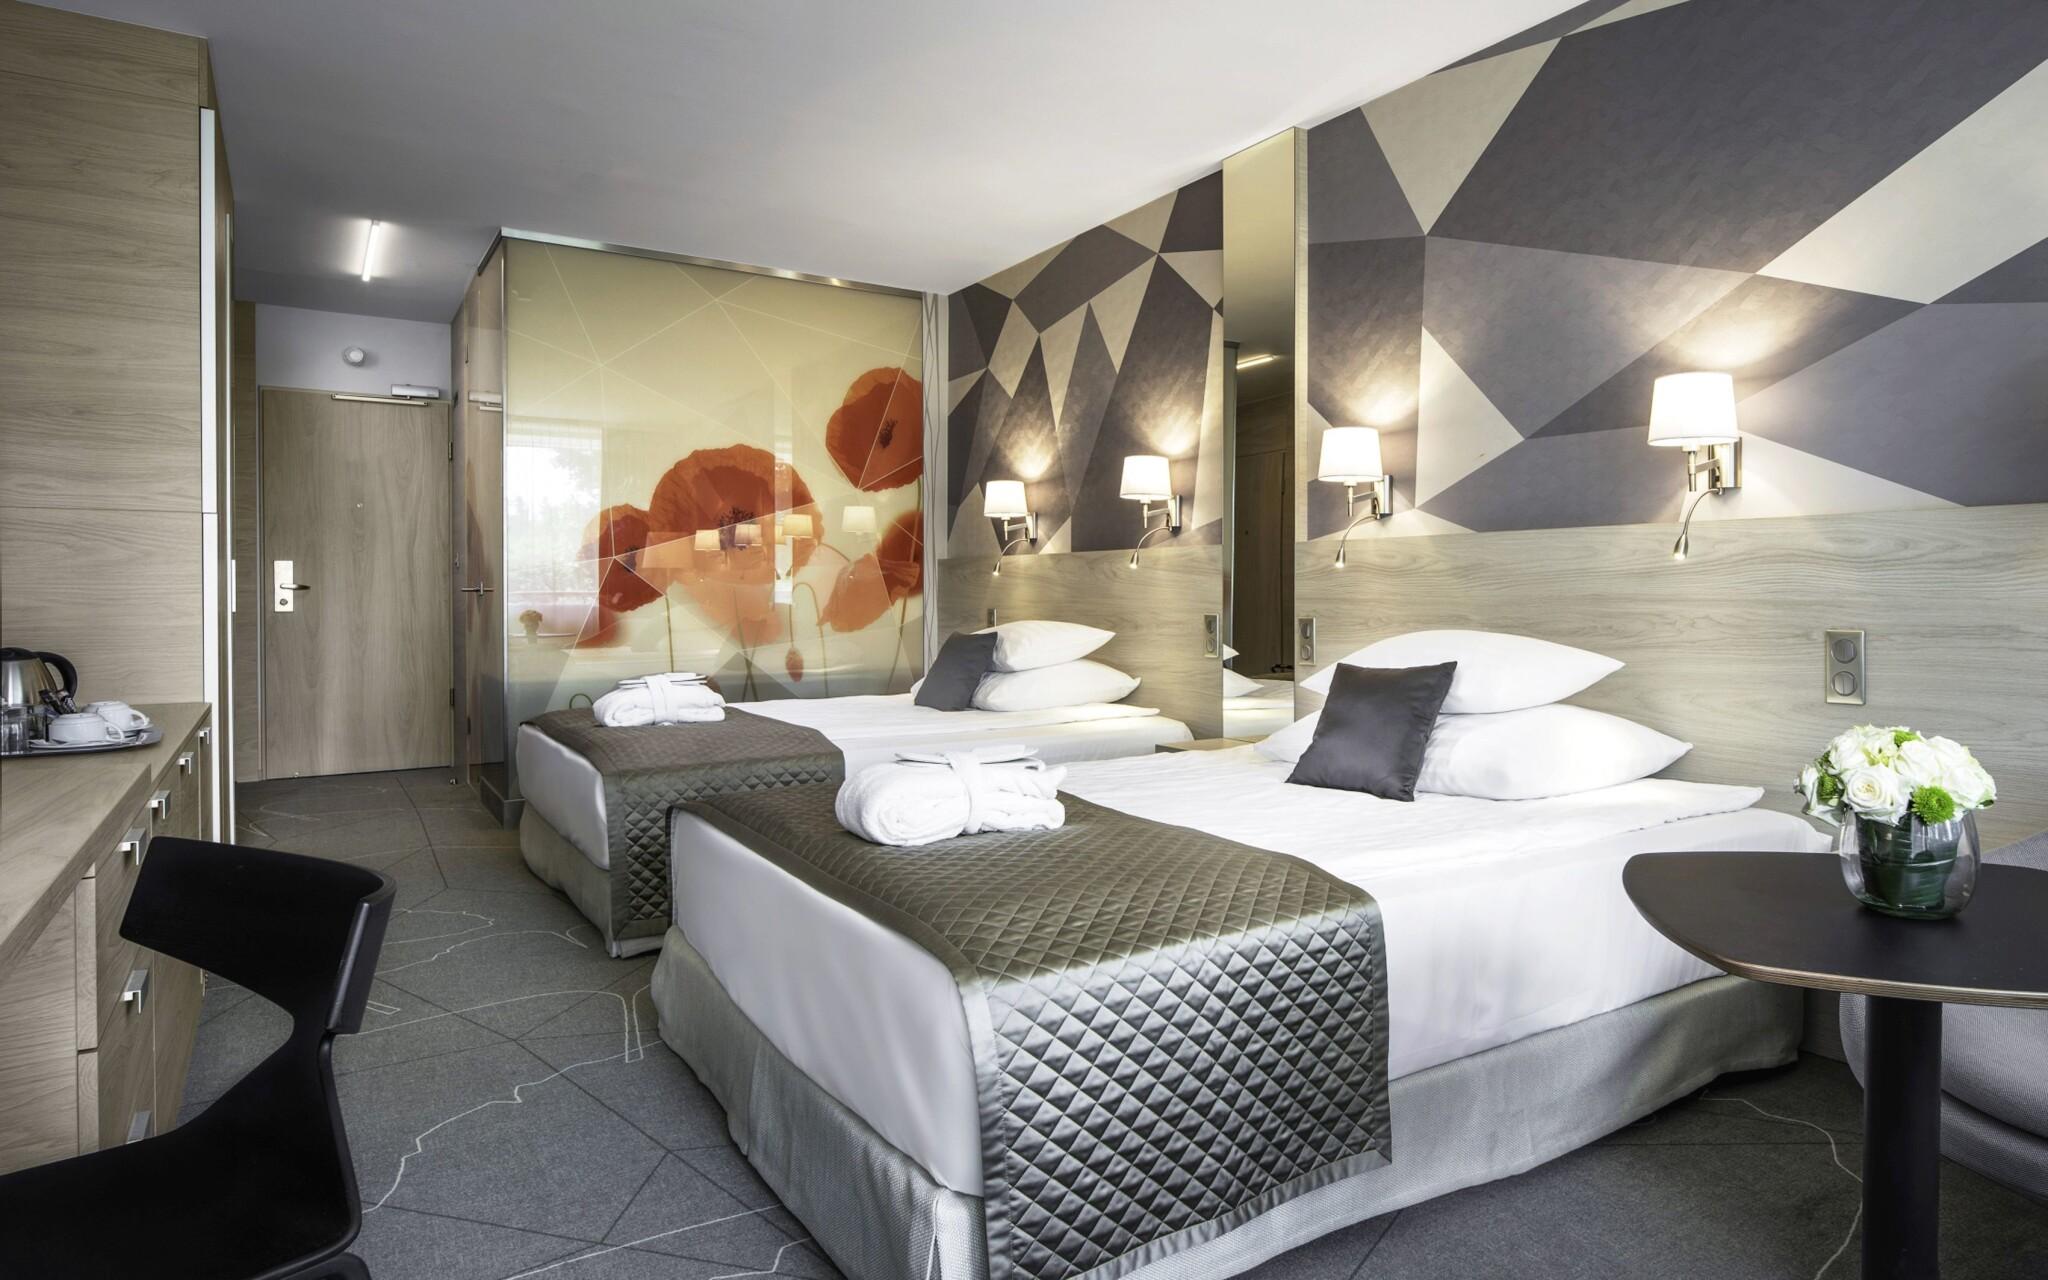 Family izba pre rodiny, Danubius Resort Margitsziget